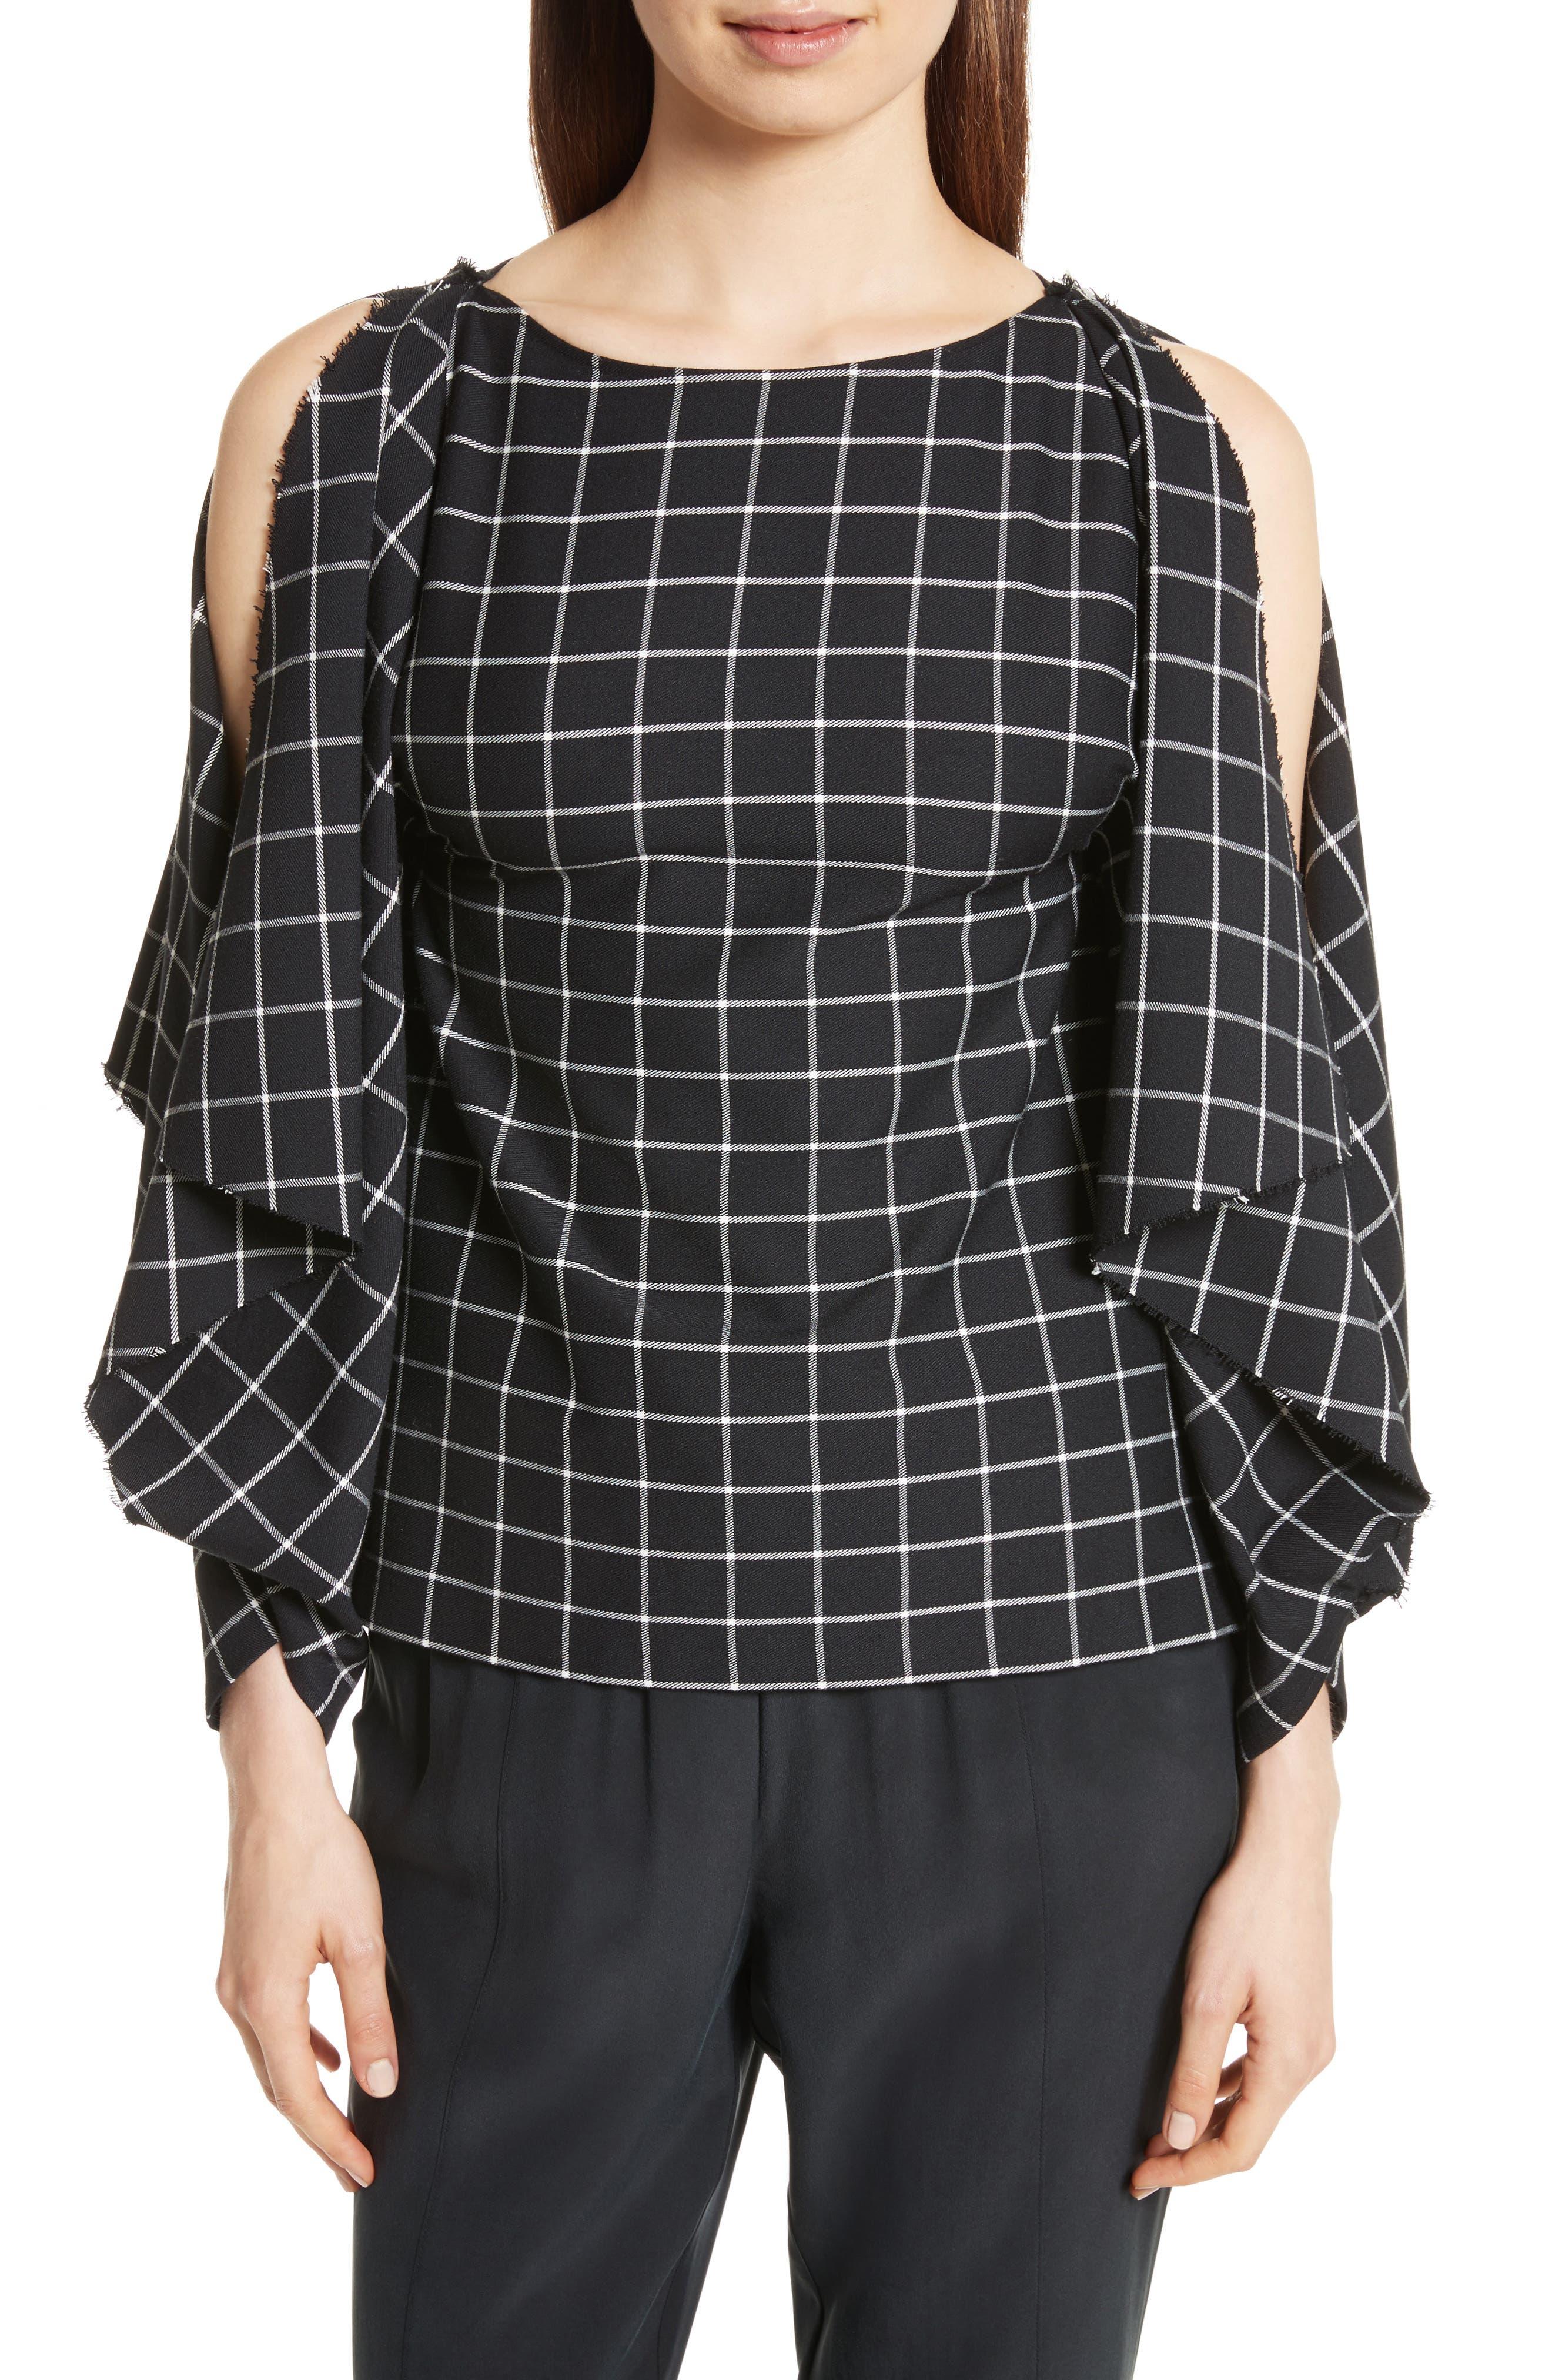 Windowpane Print Cold Shoulder Top,                         Main,                         color, Black/ White Plaid